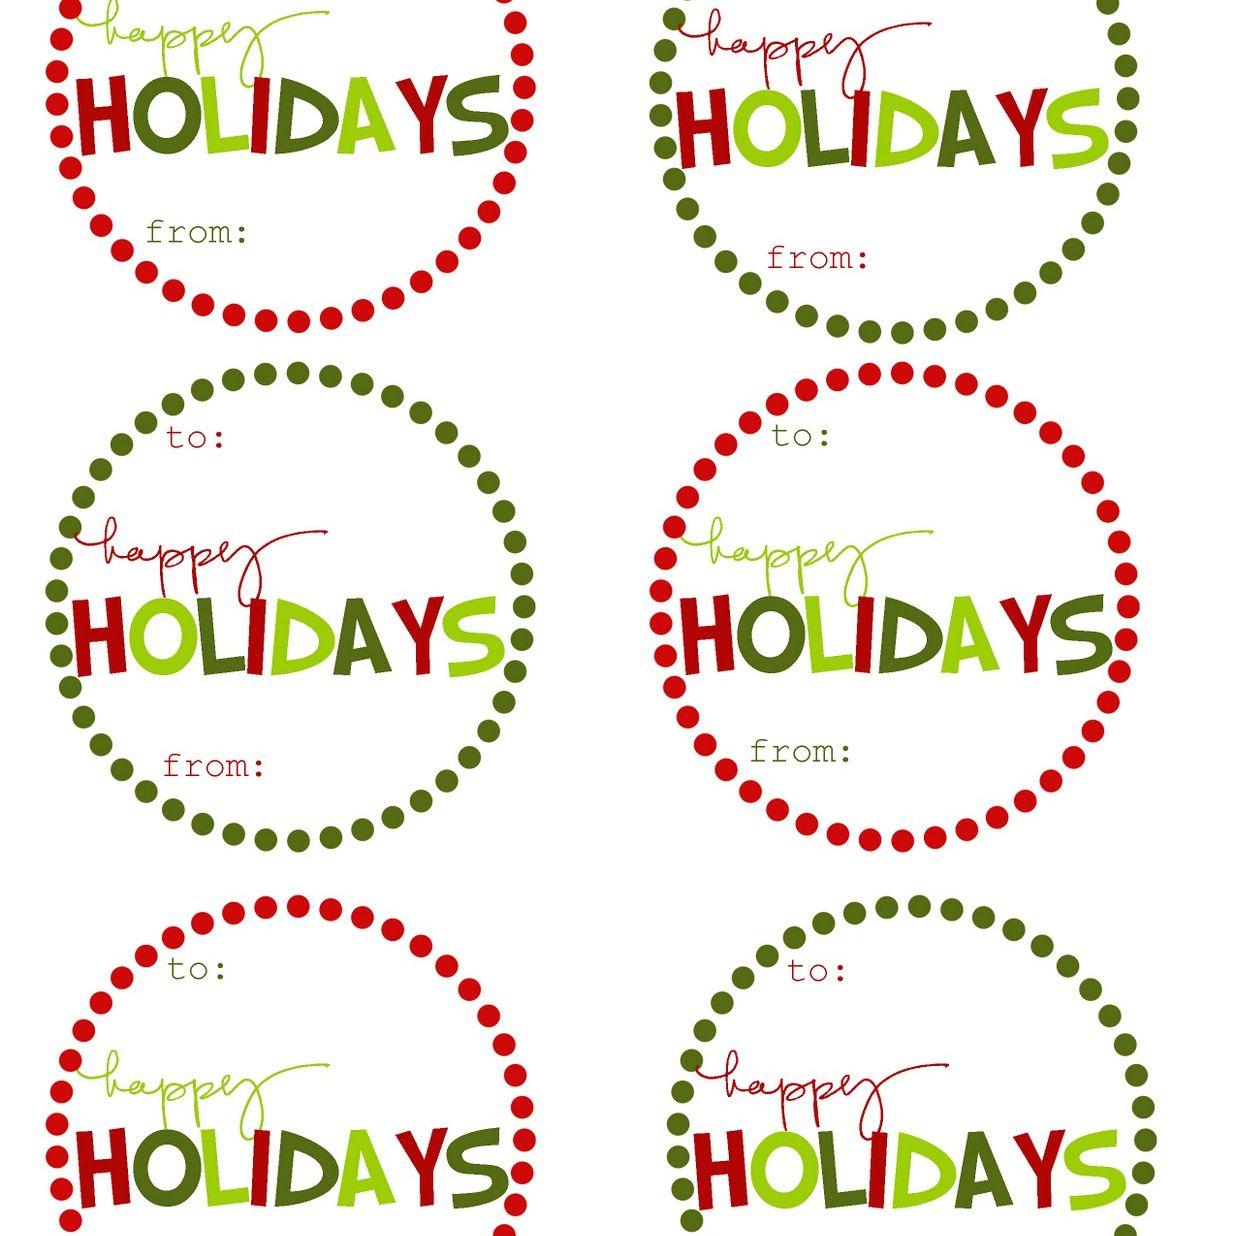 40 Sets Of Free Printable Christmas Gift Tags - Free Printable Holiday Labels